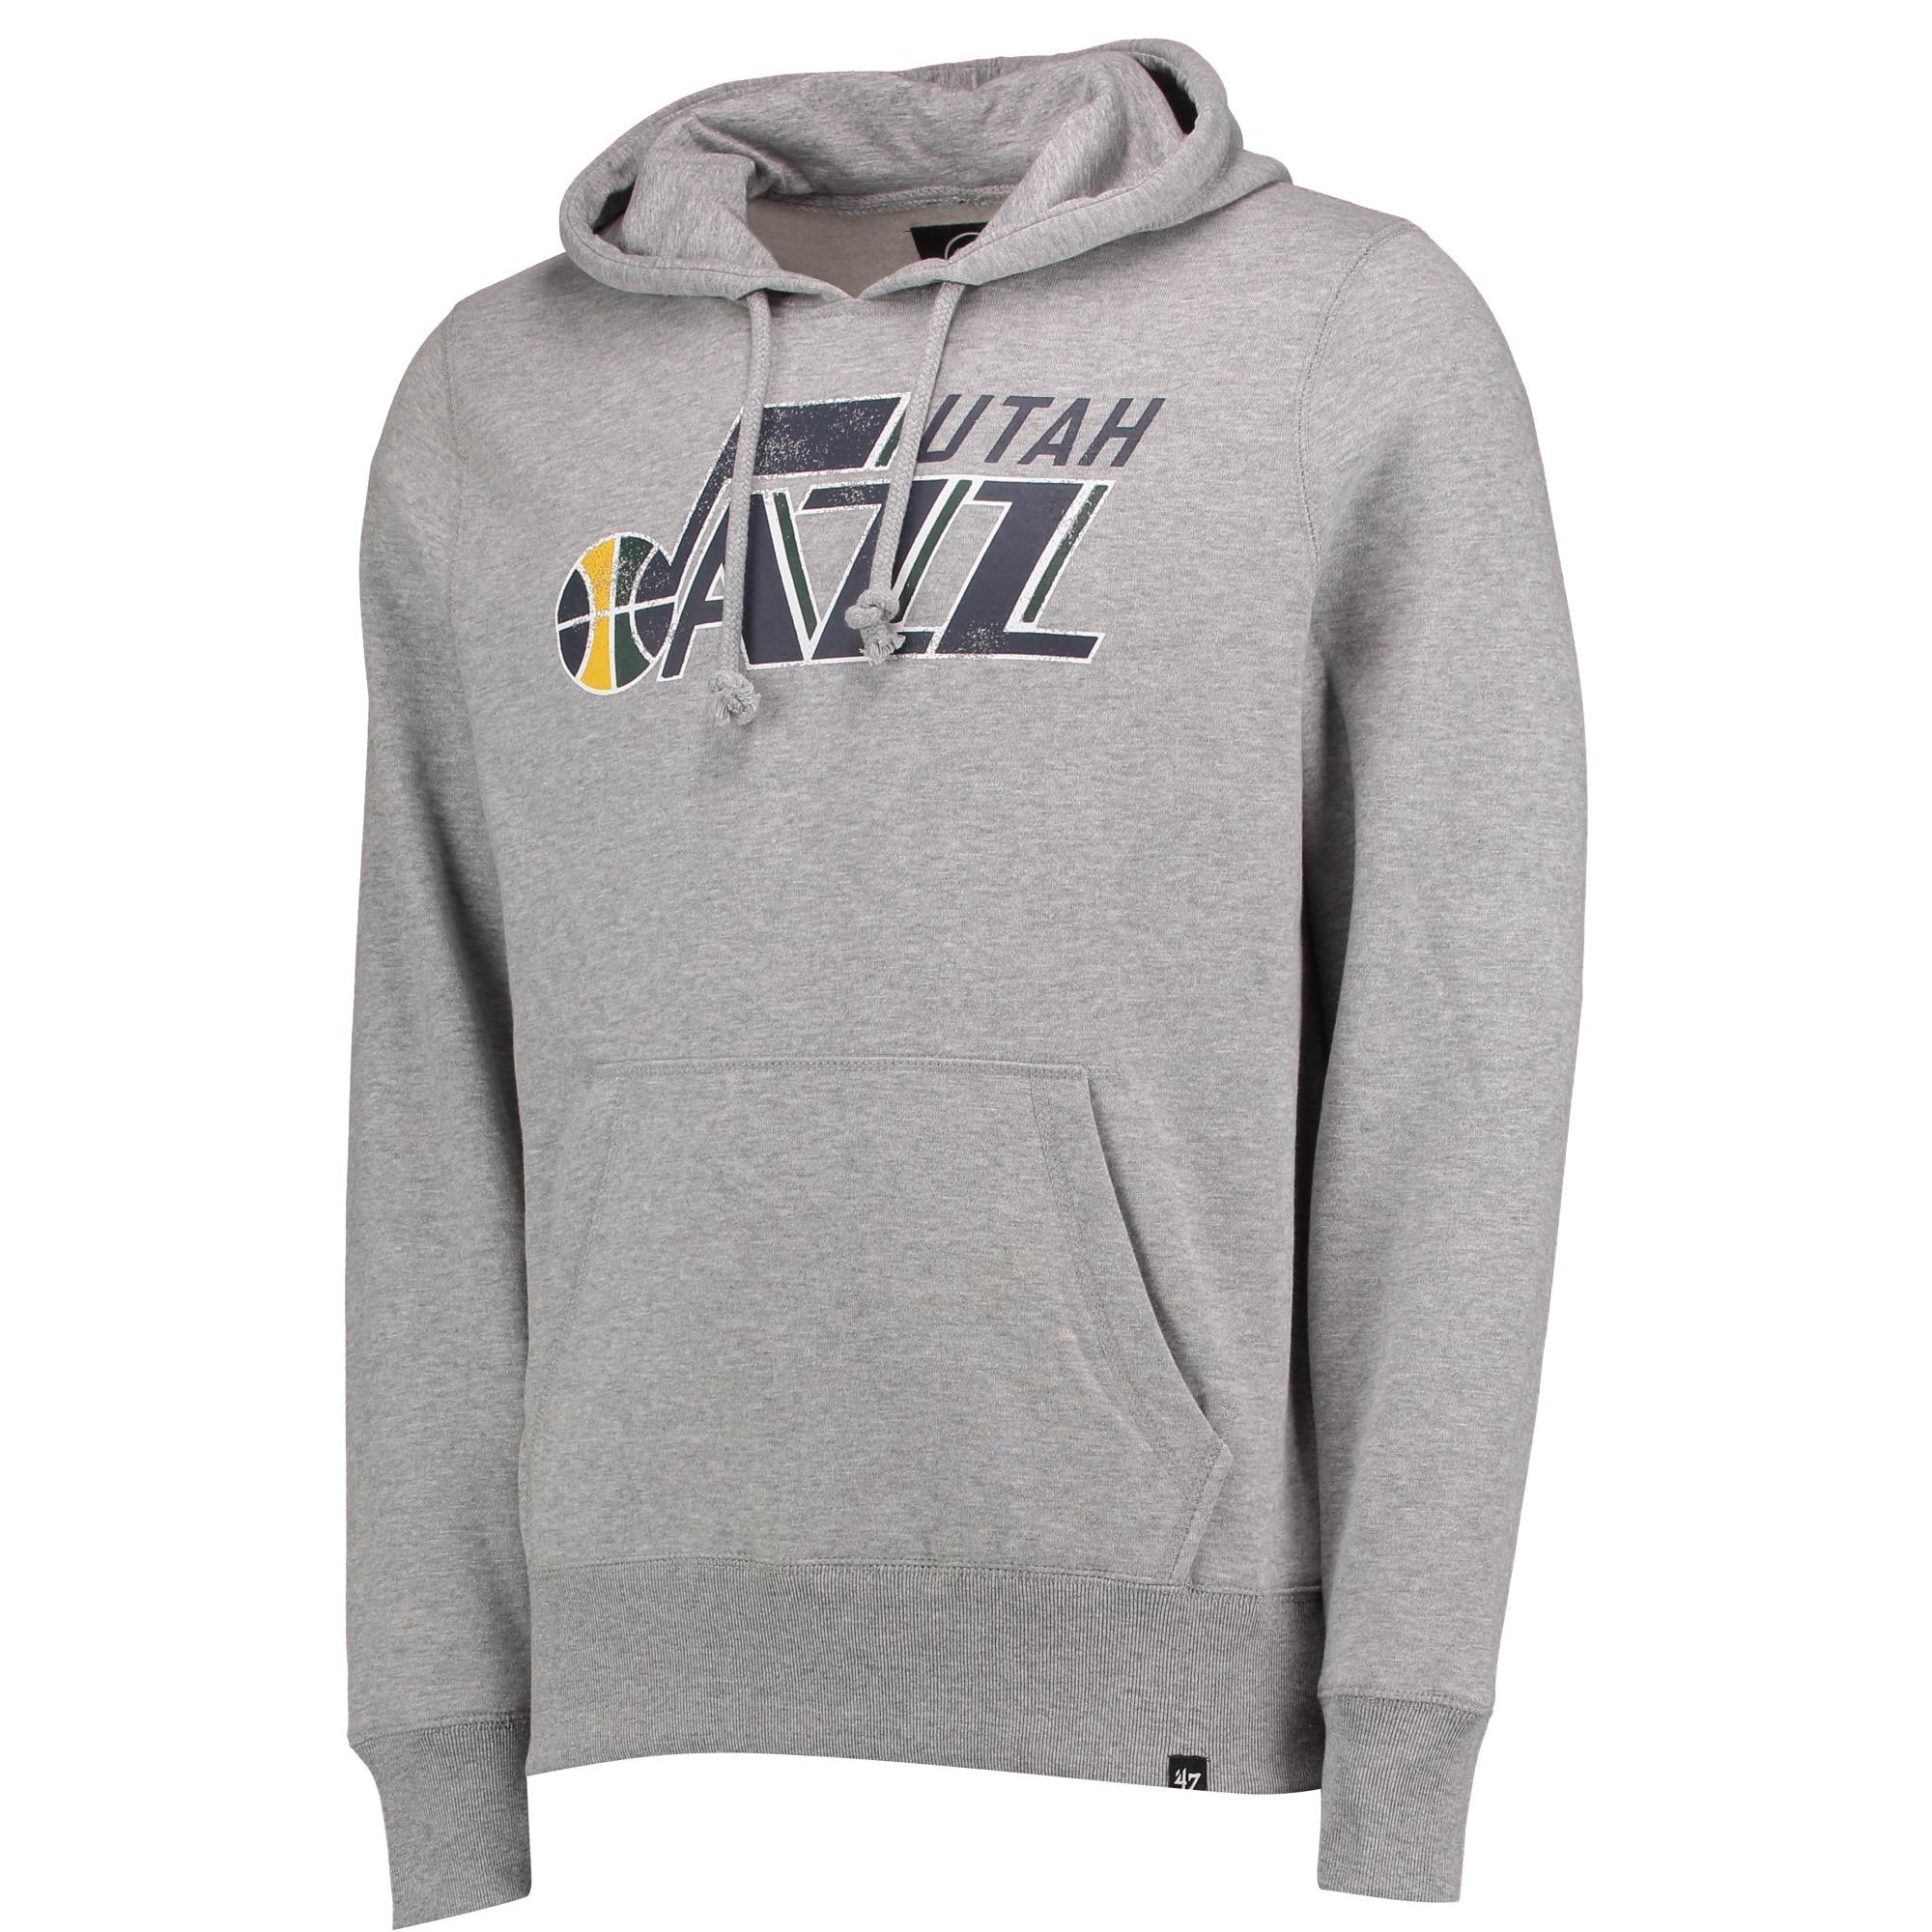 Utah Jazz 47 Core Knockaround Hoodie - Mens